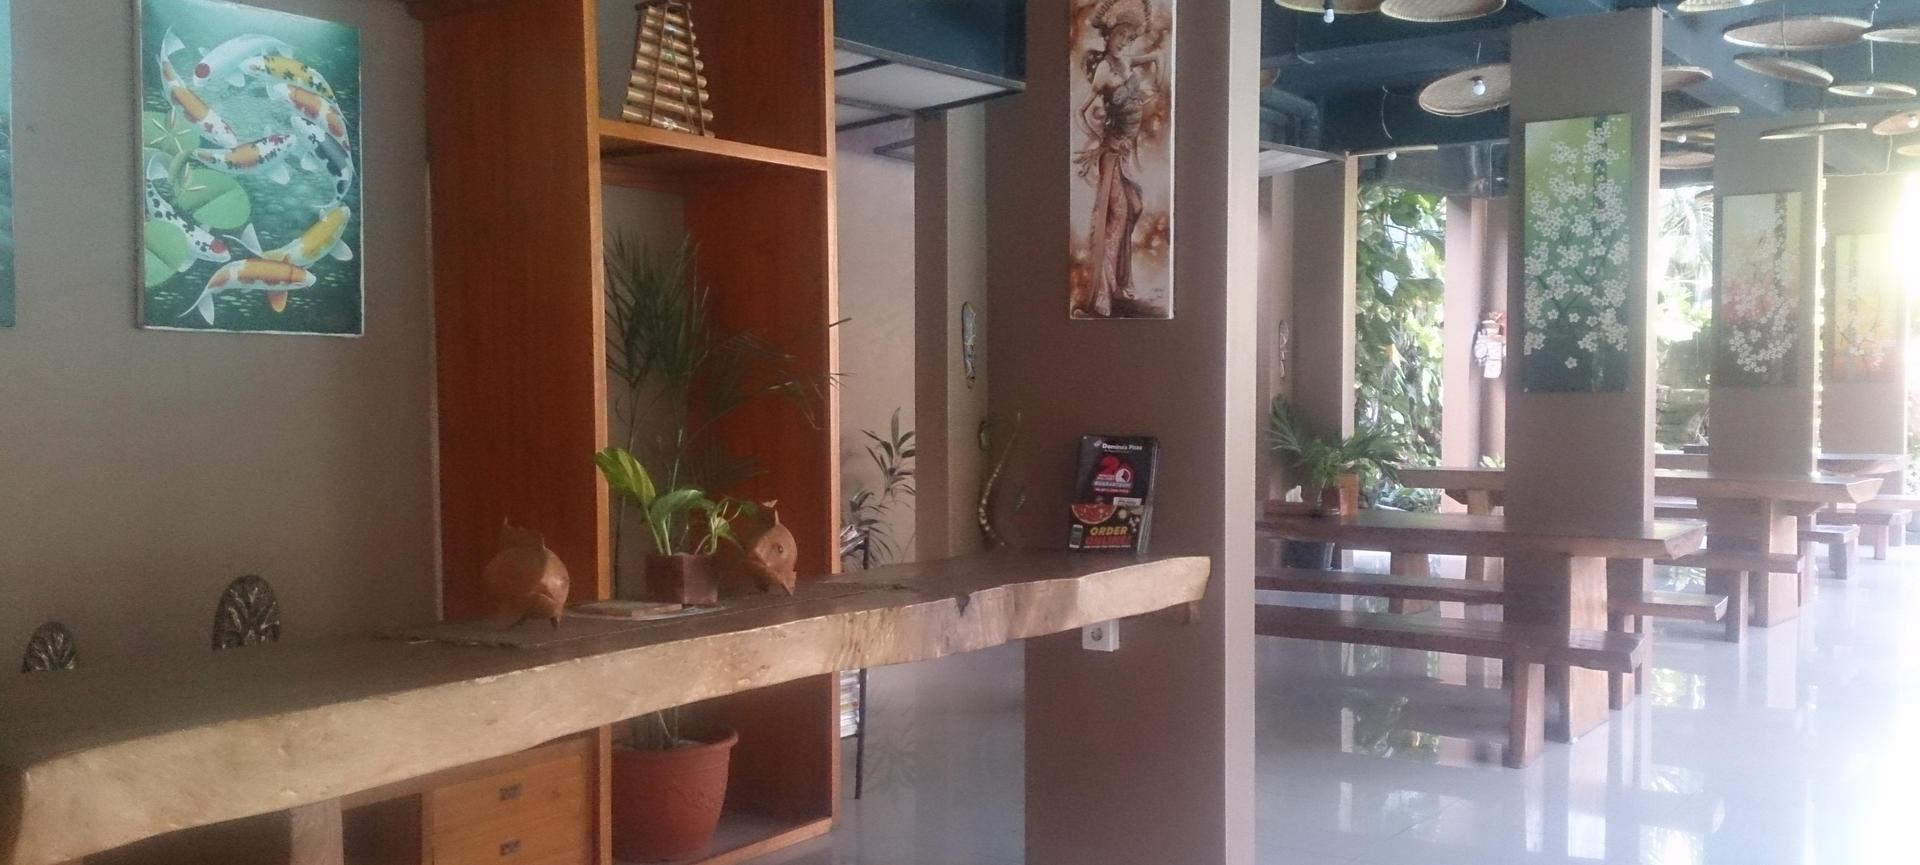 Koi Hotel And Residence: Rest And Rejuvenate In Denpasar, Bali